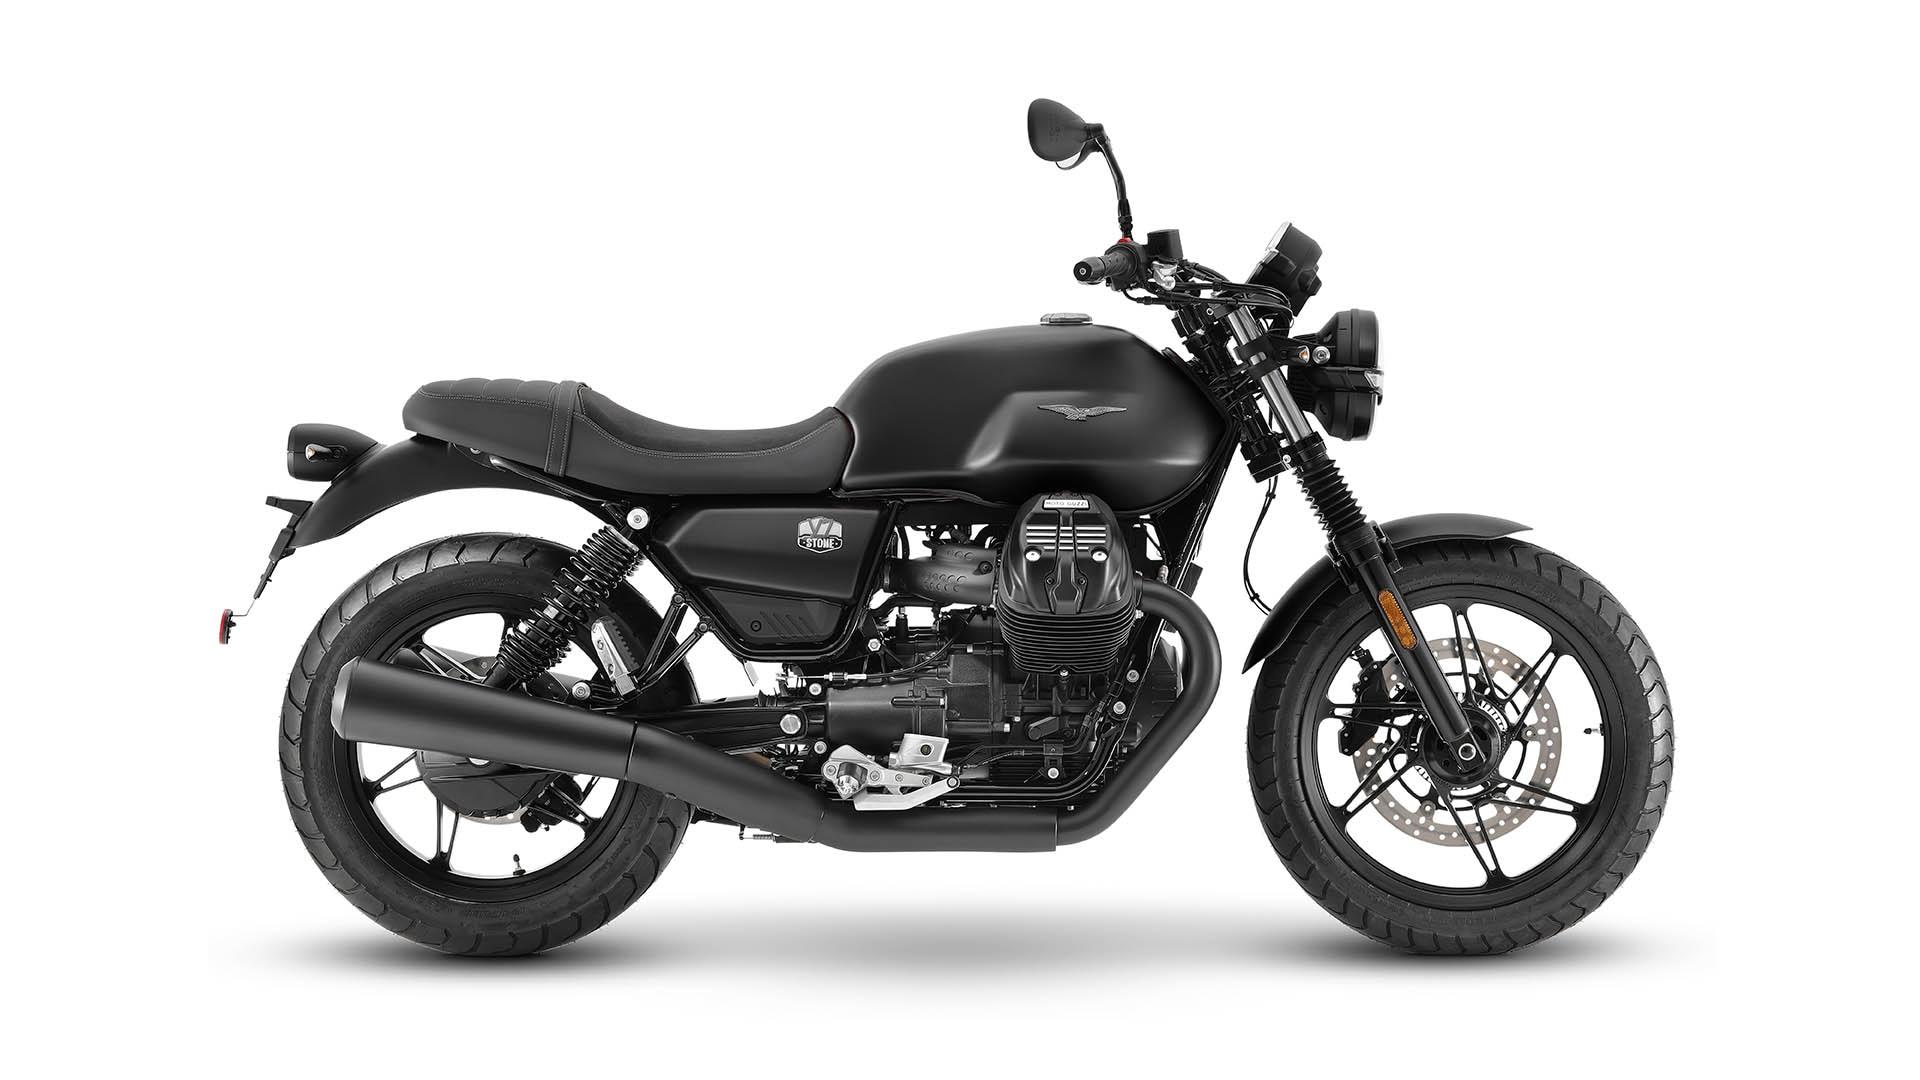 Moto Guzzi V7 2021 Nero Ruvido noir côté droit